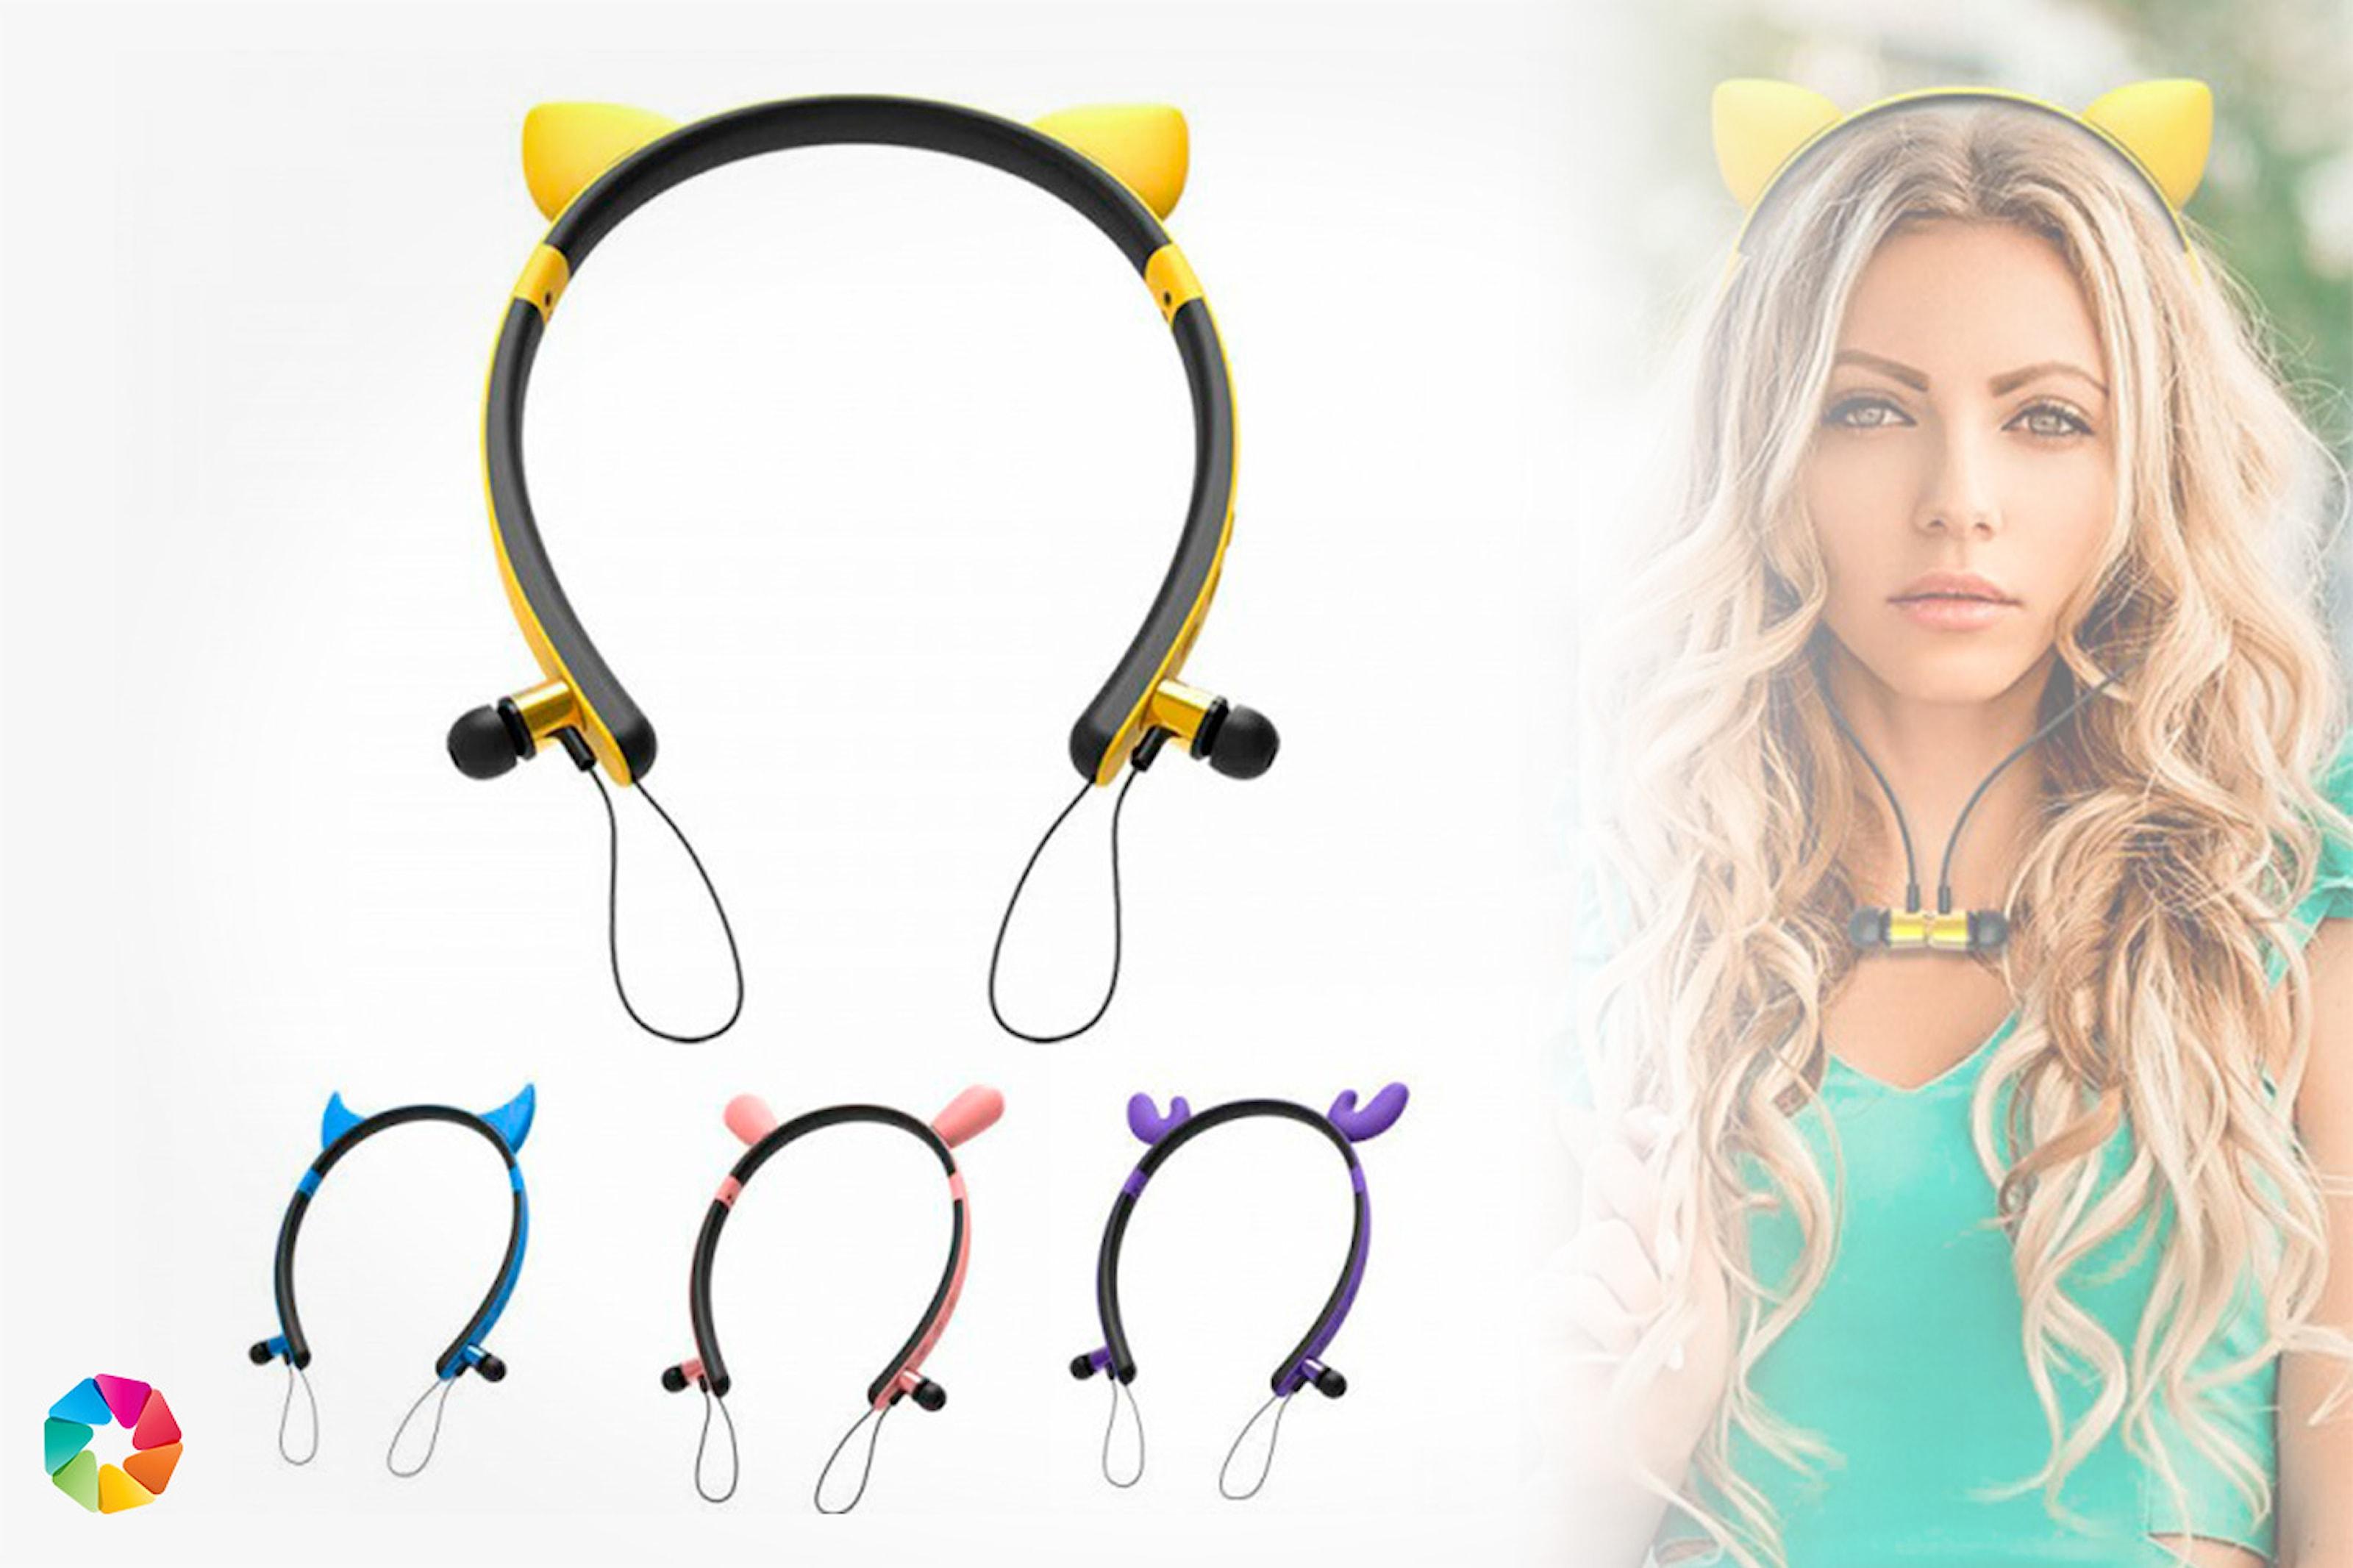 Cosplay Bluetooth-headset